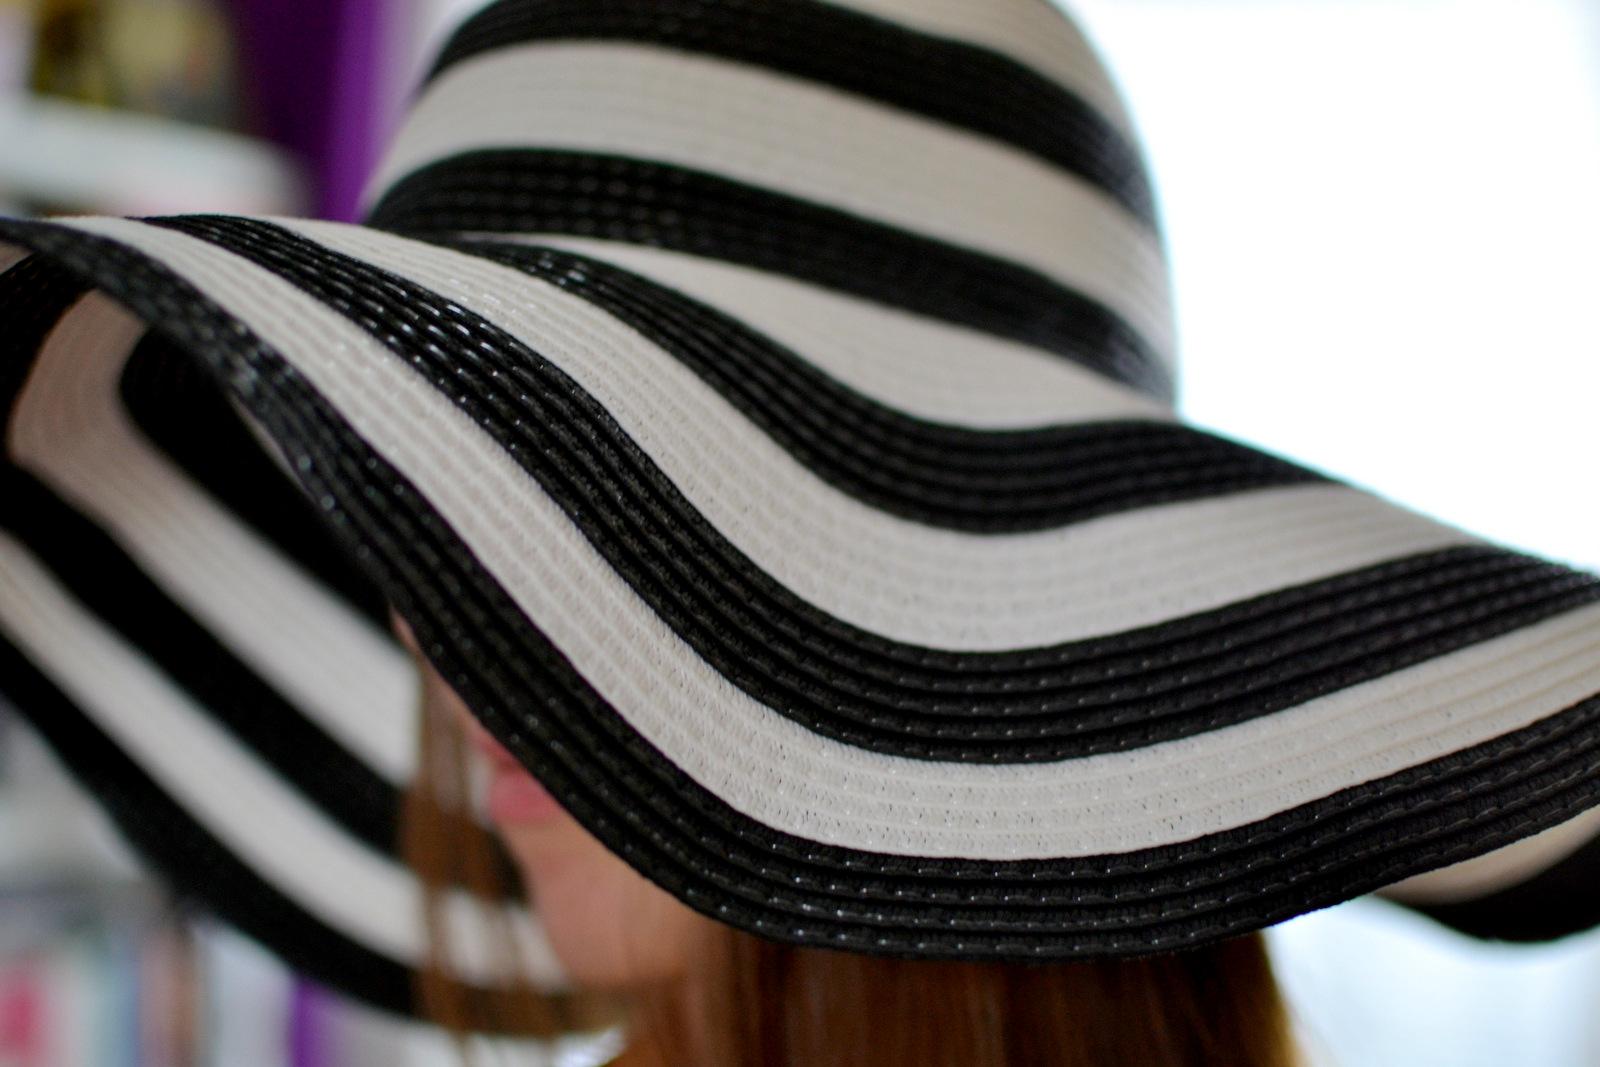 4f19c53e3 ako zbaliť klobúk do kufra na dovolenku // how to pack a hat for holiday